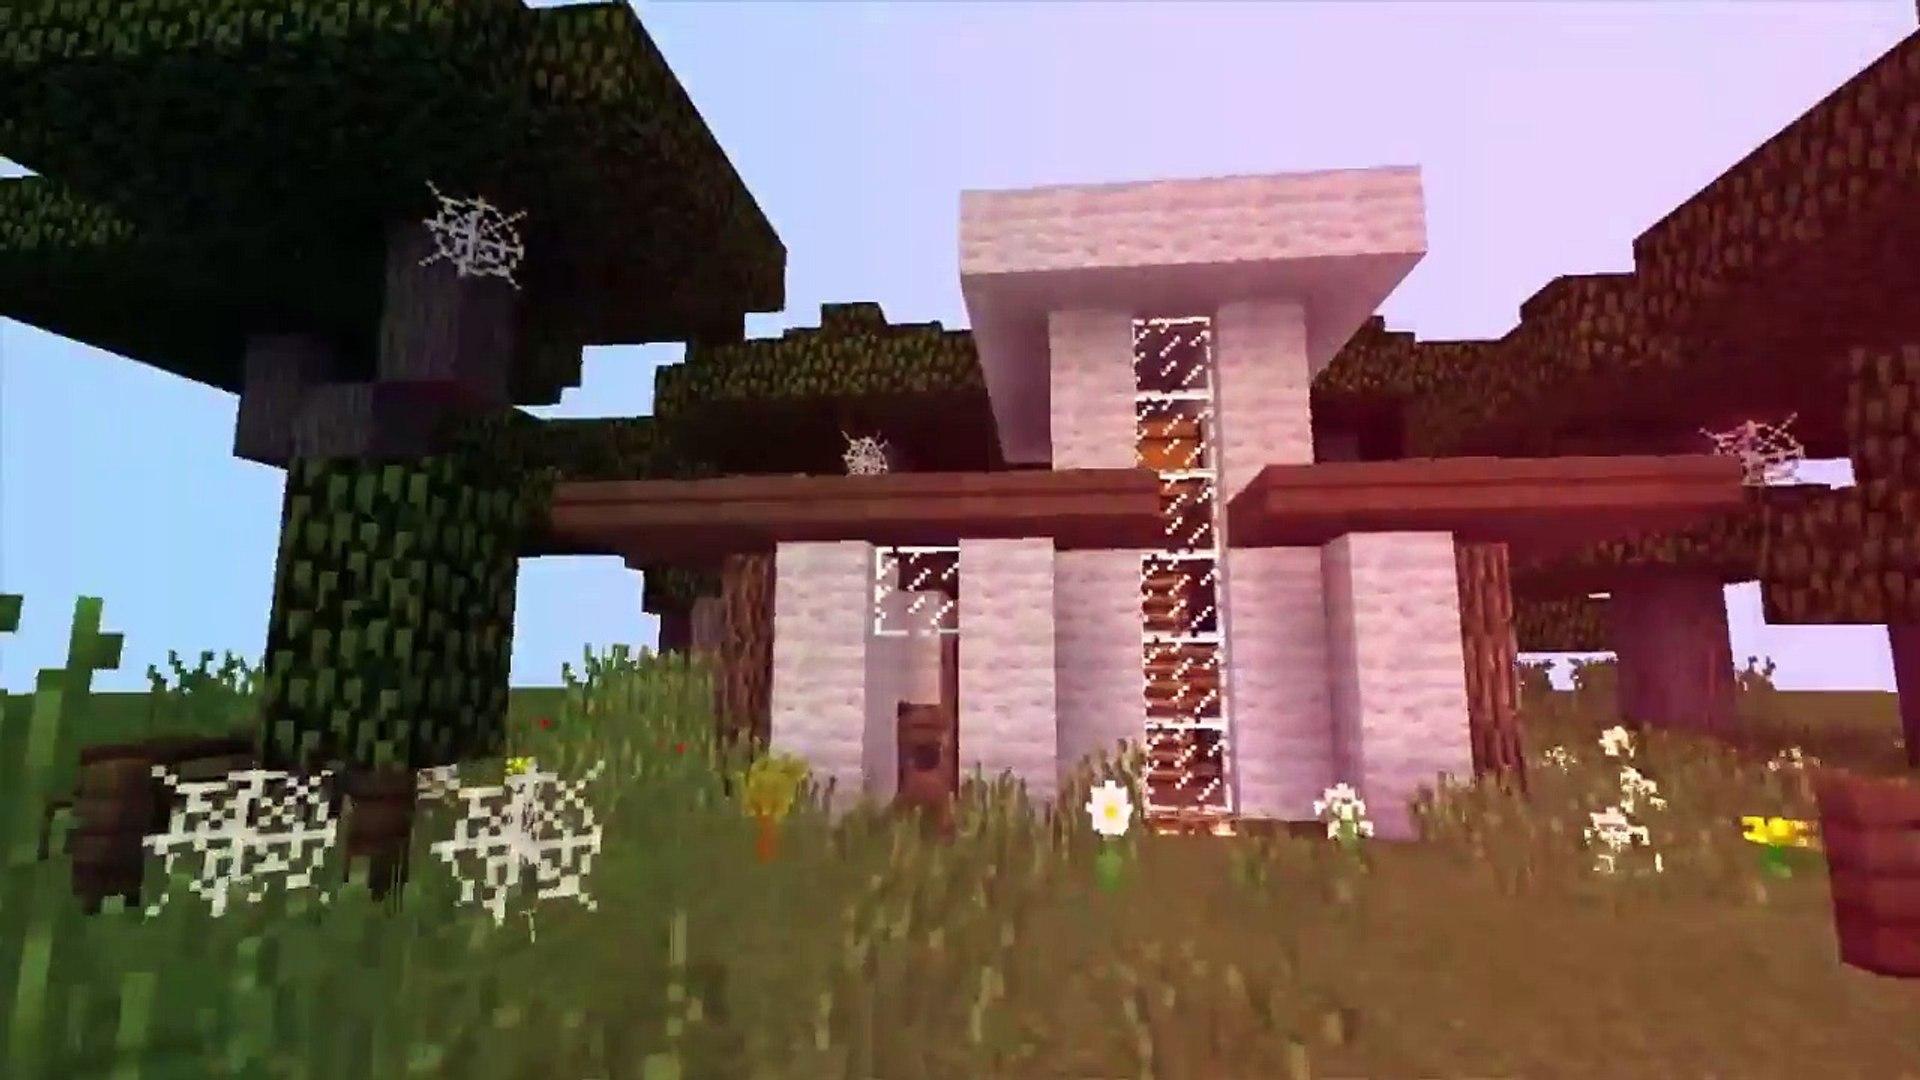 Компактный модерн дом, для выживания в майнкрафте. The best modern house for surviving in minecraft.